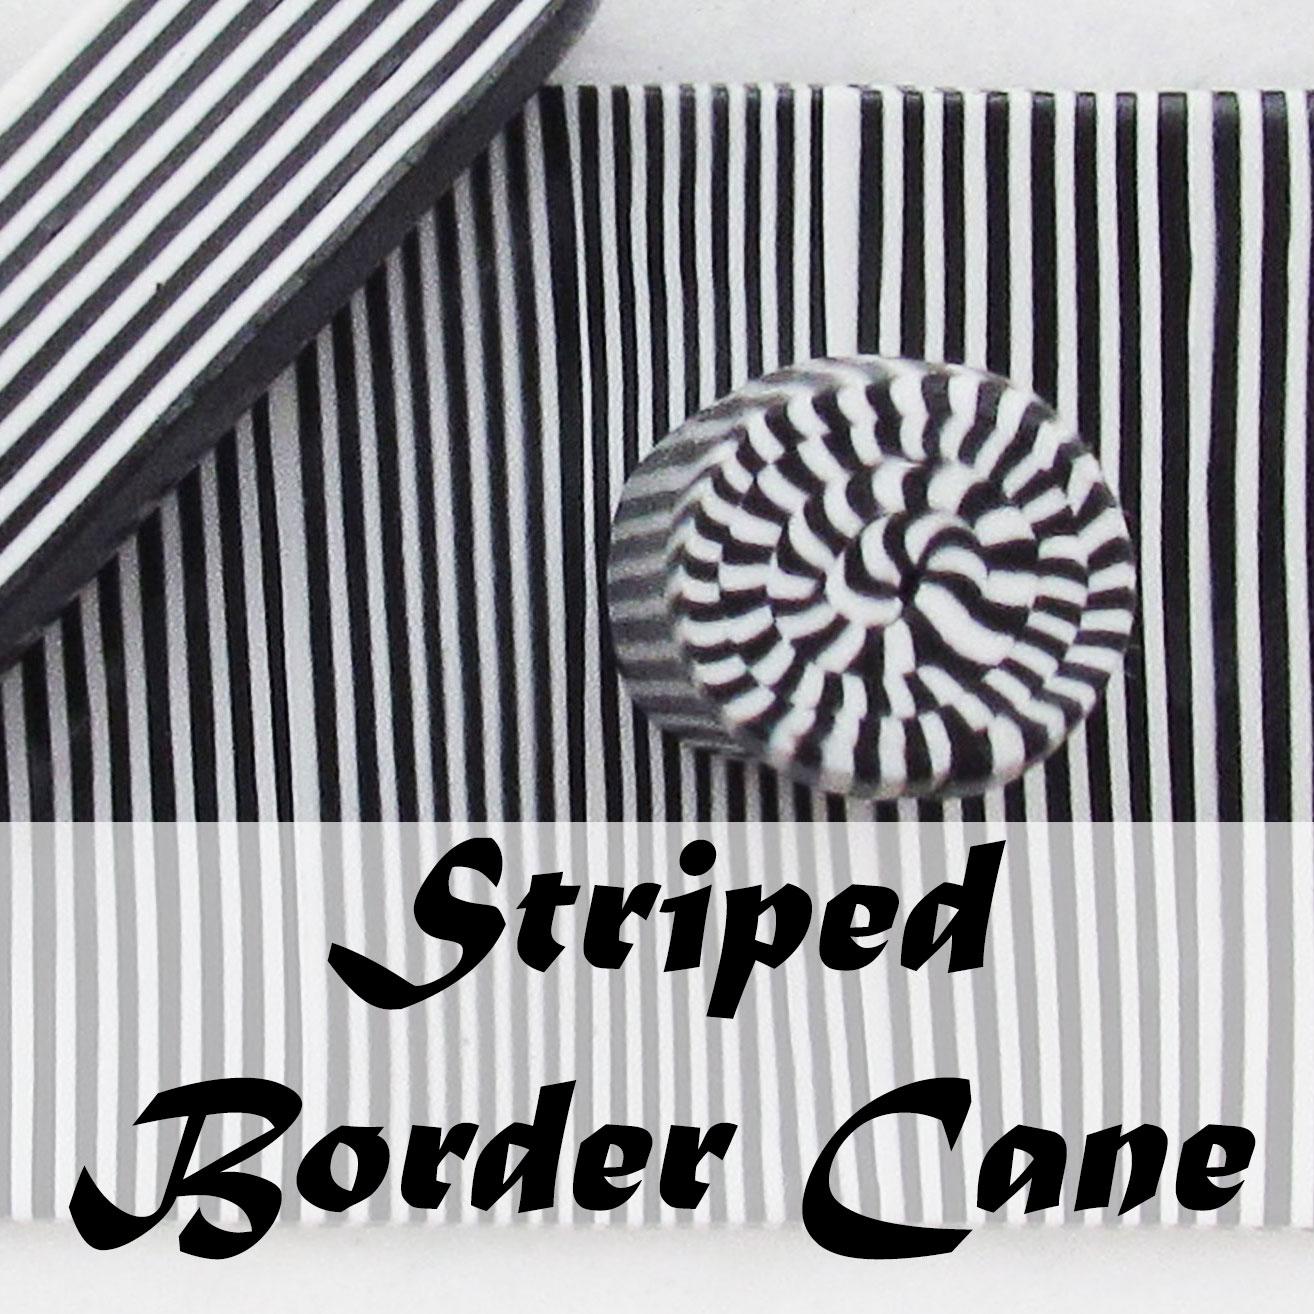 Polymer clay striped checkerboard border cane